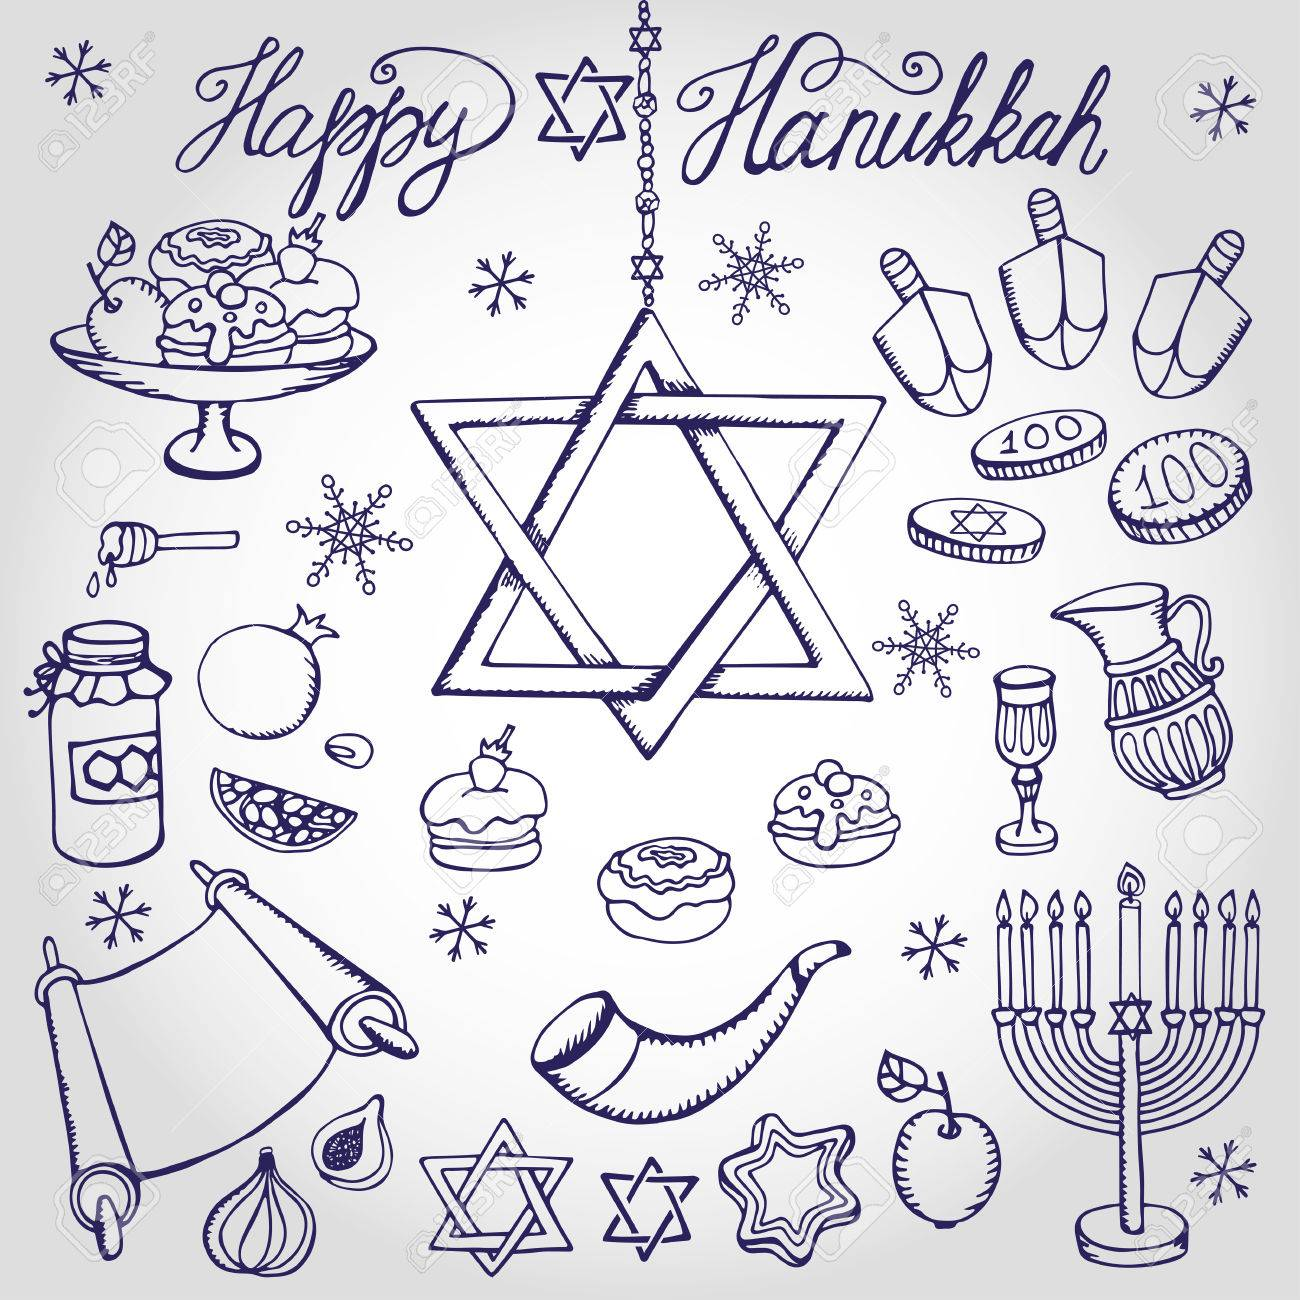 Hanukkah Symbols Setodle Hand Drawing Jewish Holiday Icons